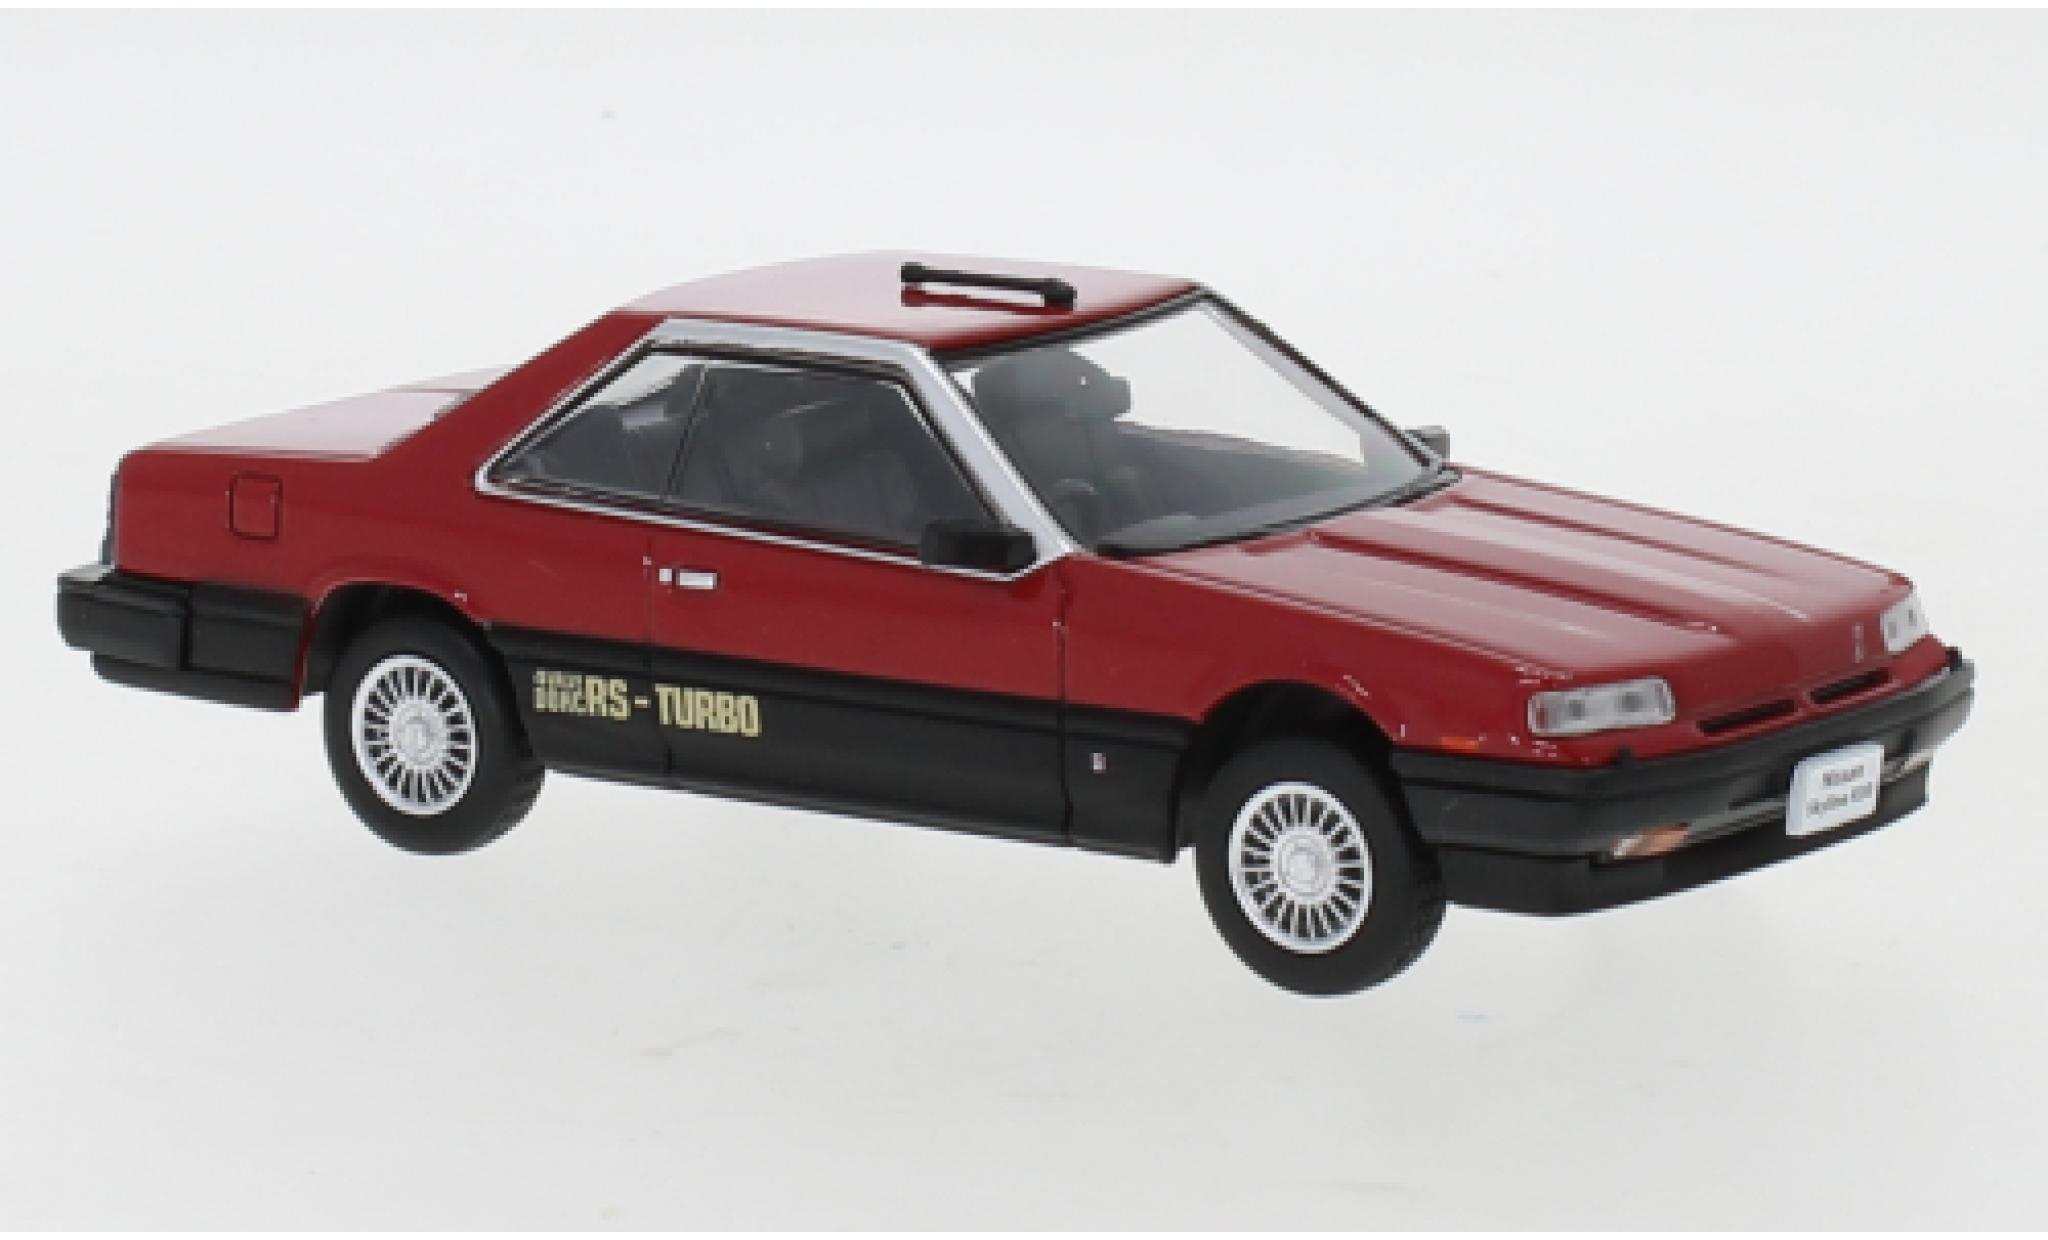 Nissan Skyline 1/43 Norev Hardtop 2000 Turbo RS-X (R30) red/matt-black RHD 1983